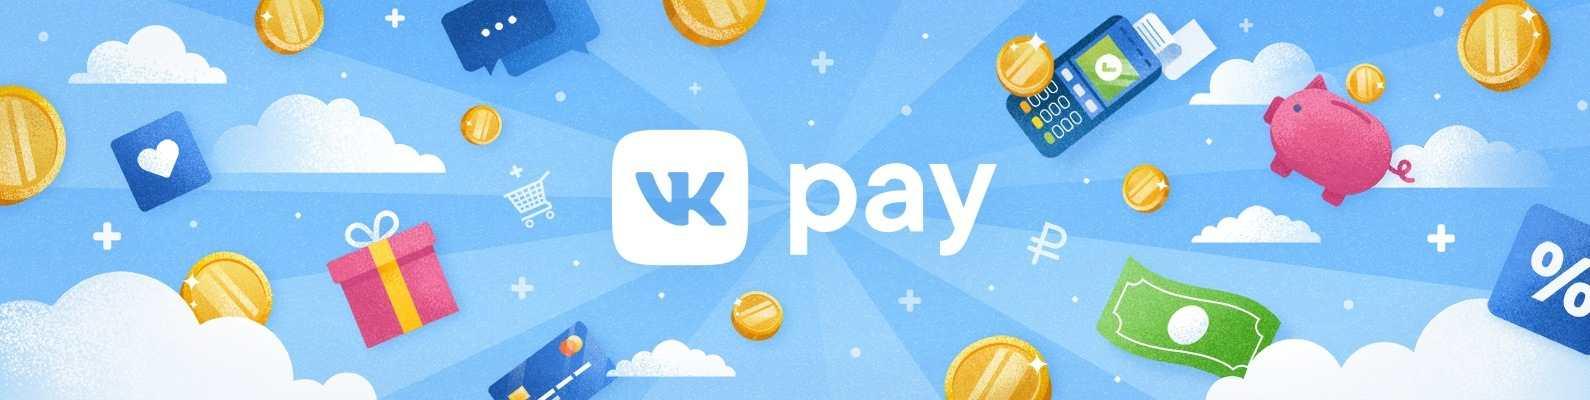 vk pay игра